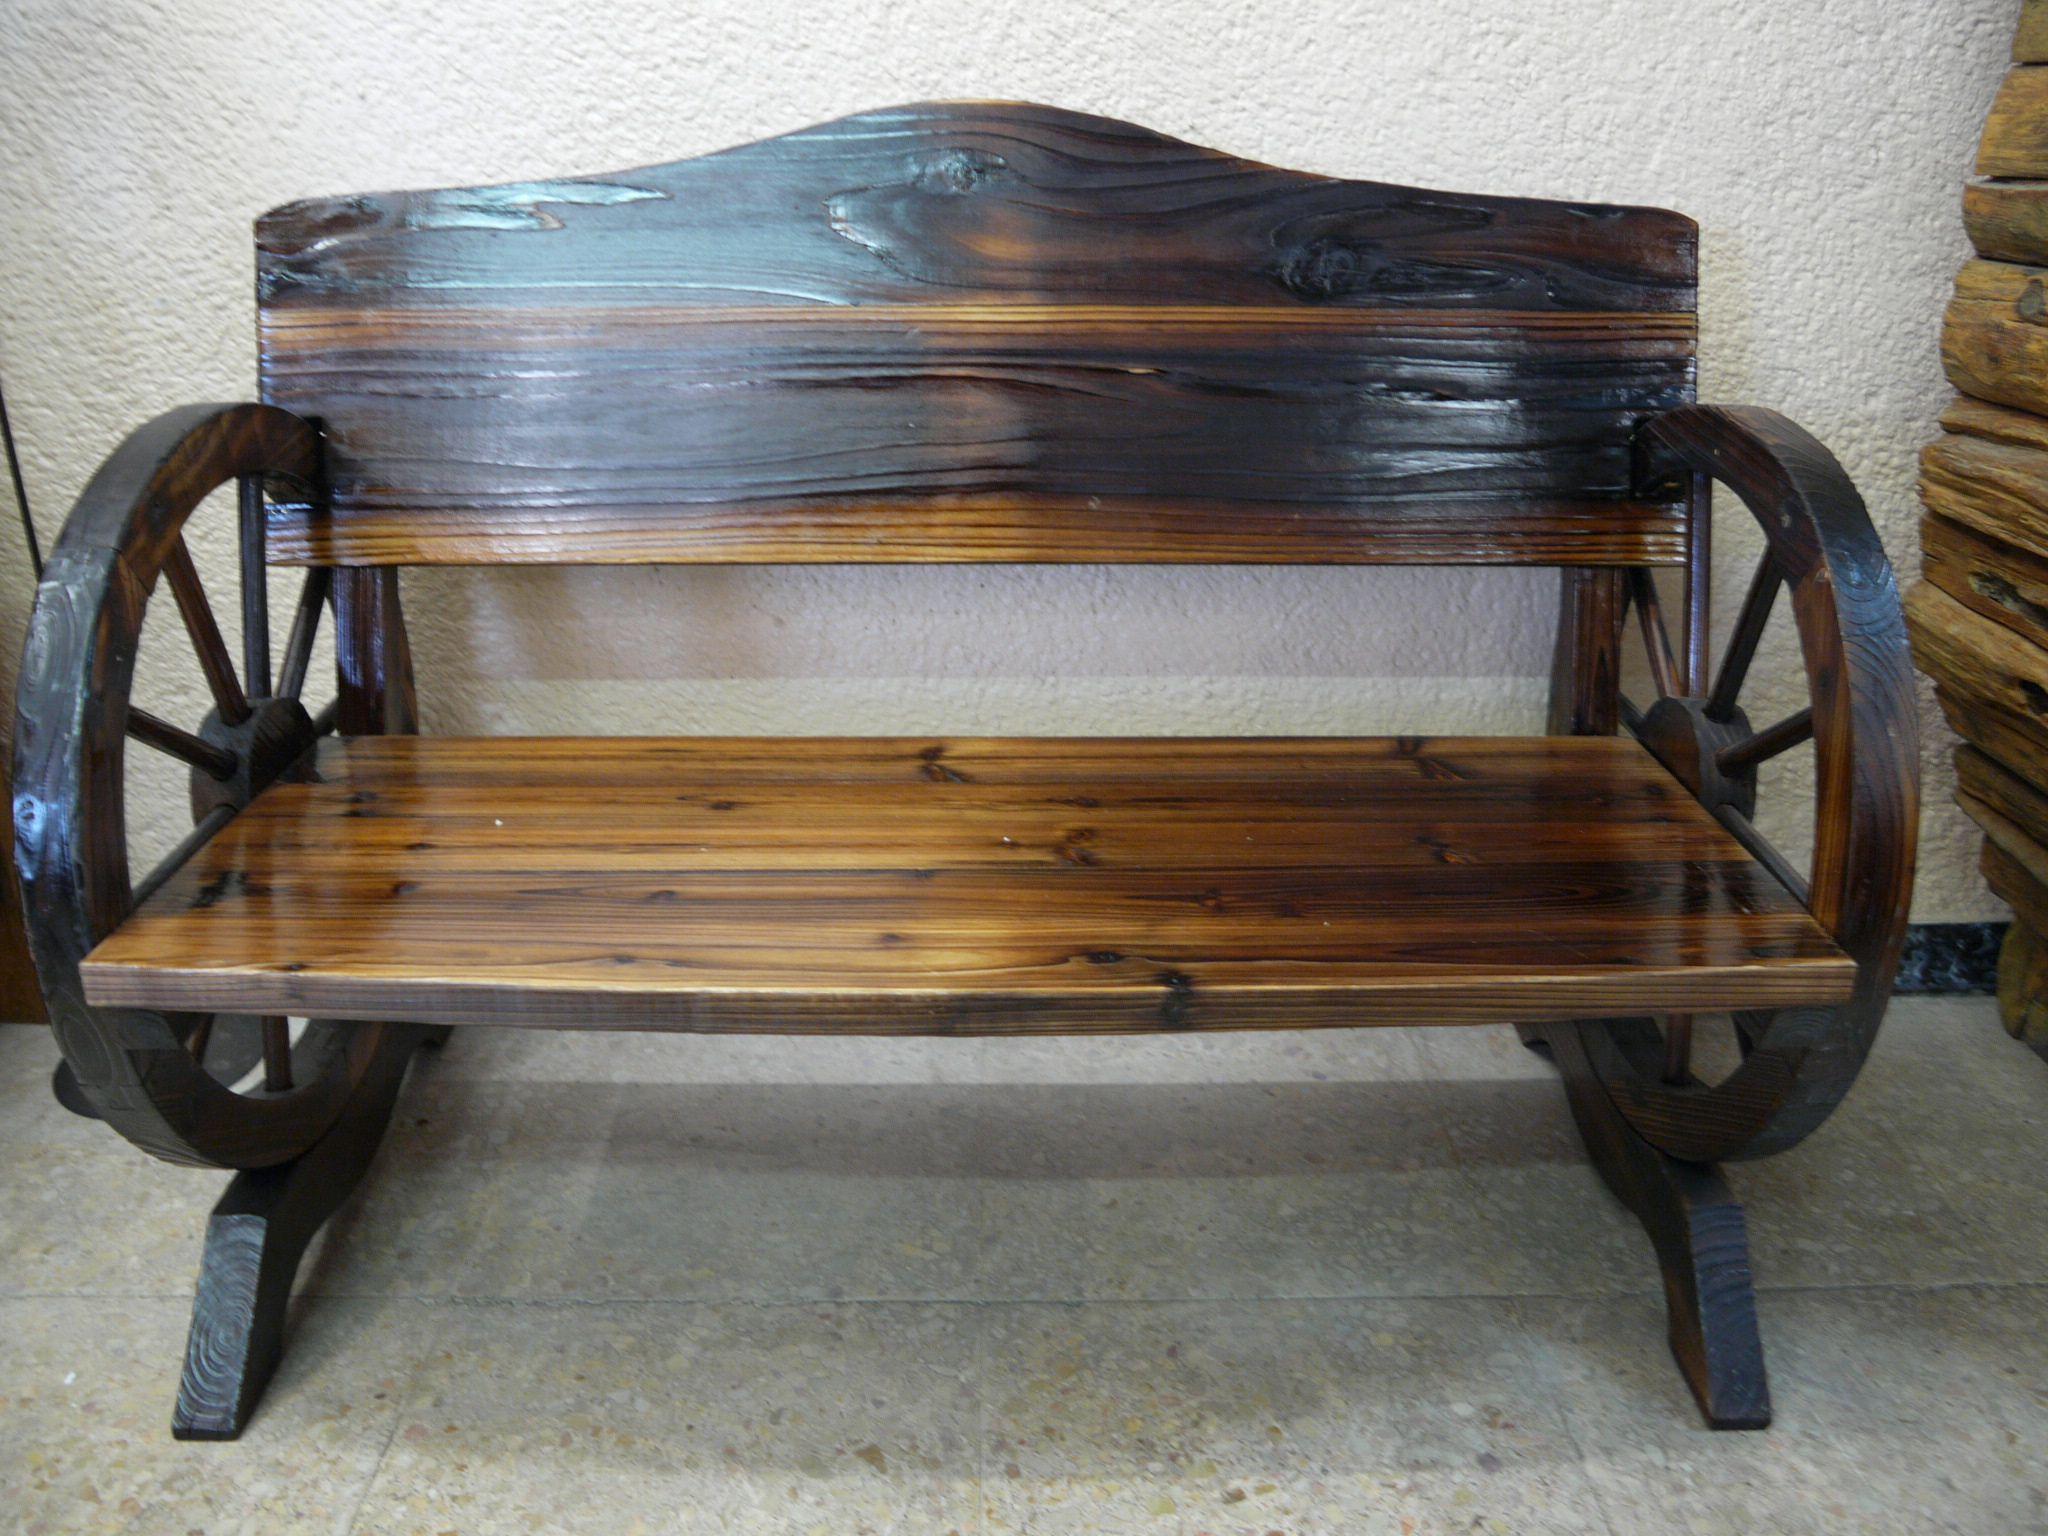 Banco rustico madera home pinterest banco r stico bancos y madera - Banco de madera rustico ...